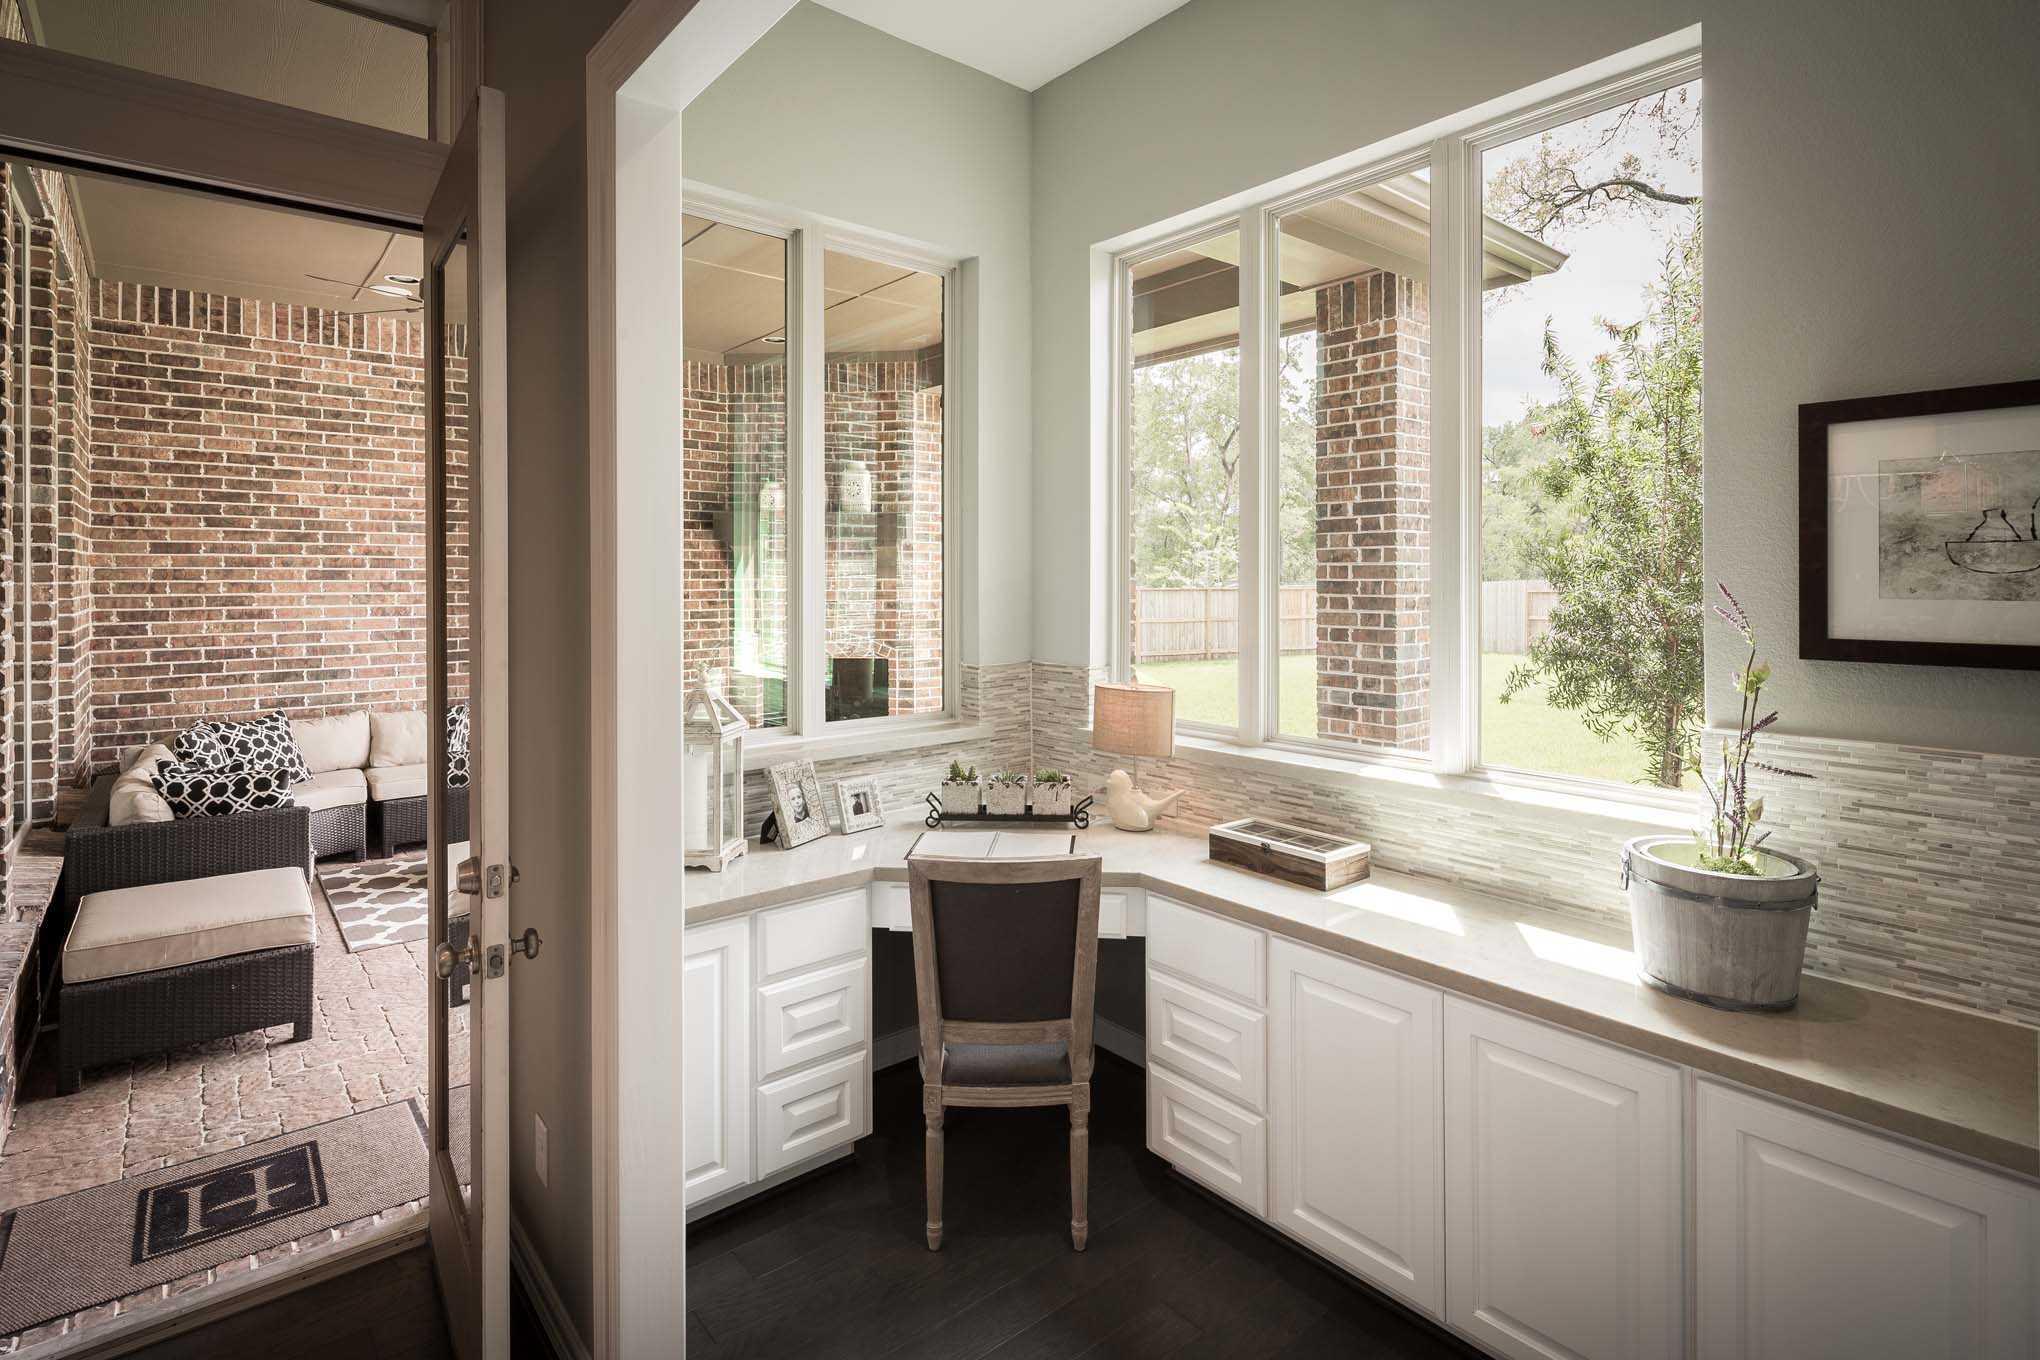 New Home Plan 297 in Richmond, TX 77407